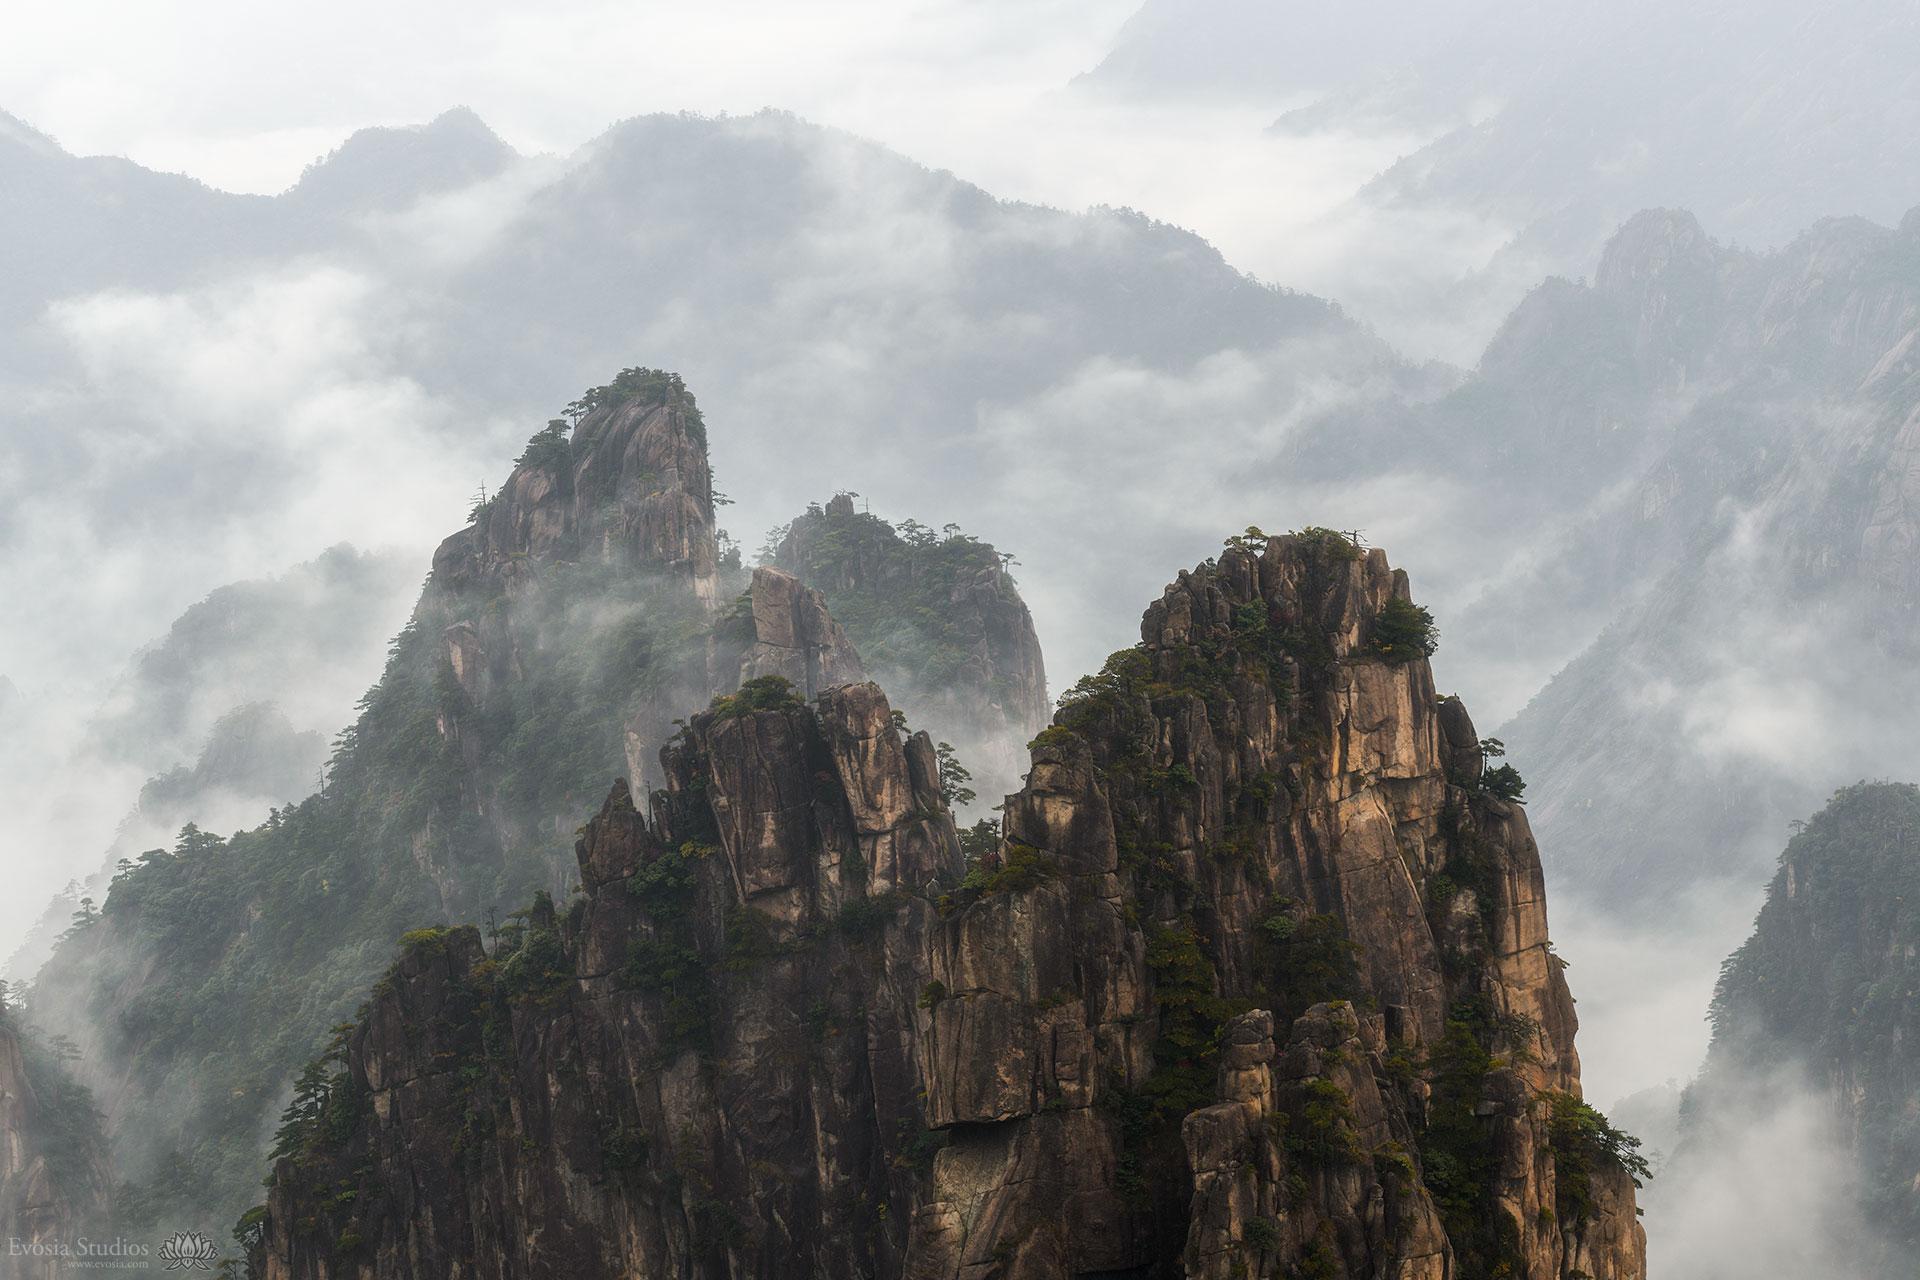 Film: 黄山 Mt Huangshan, China